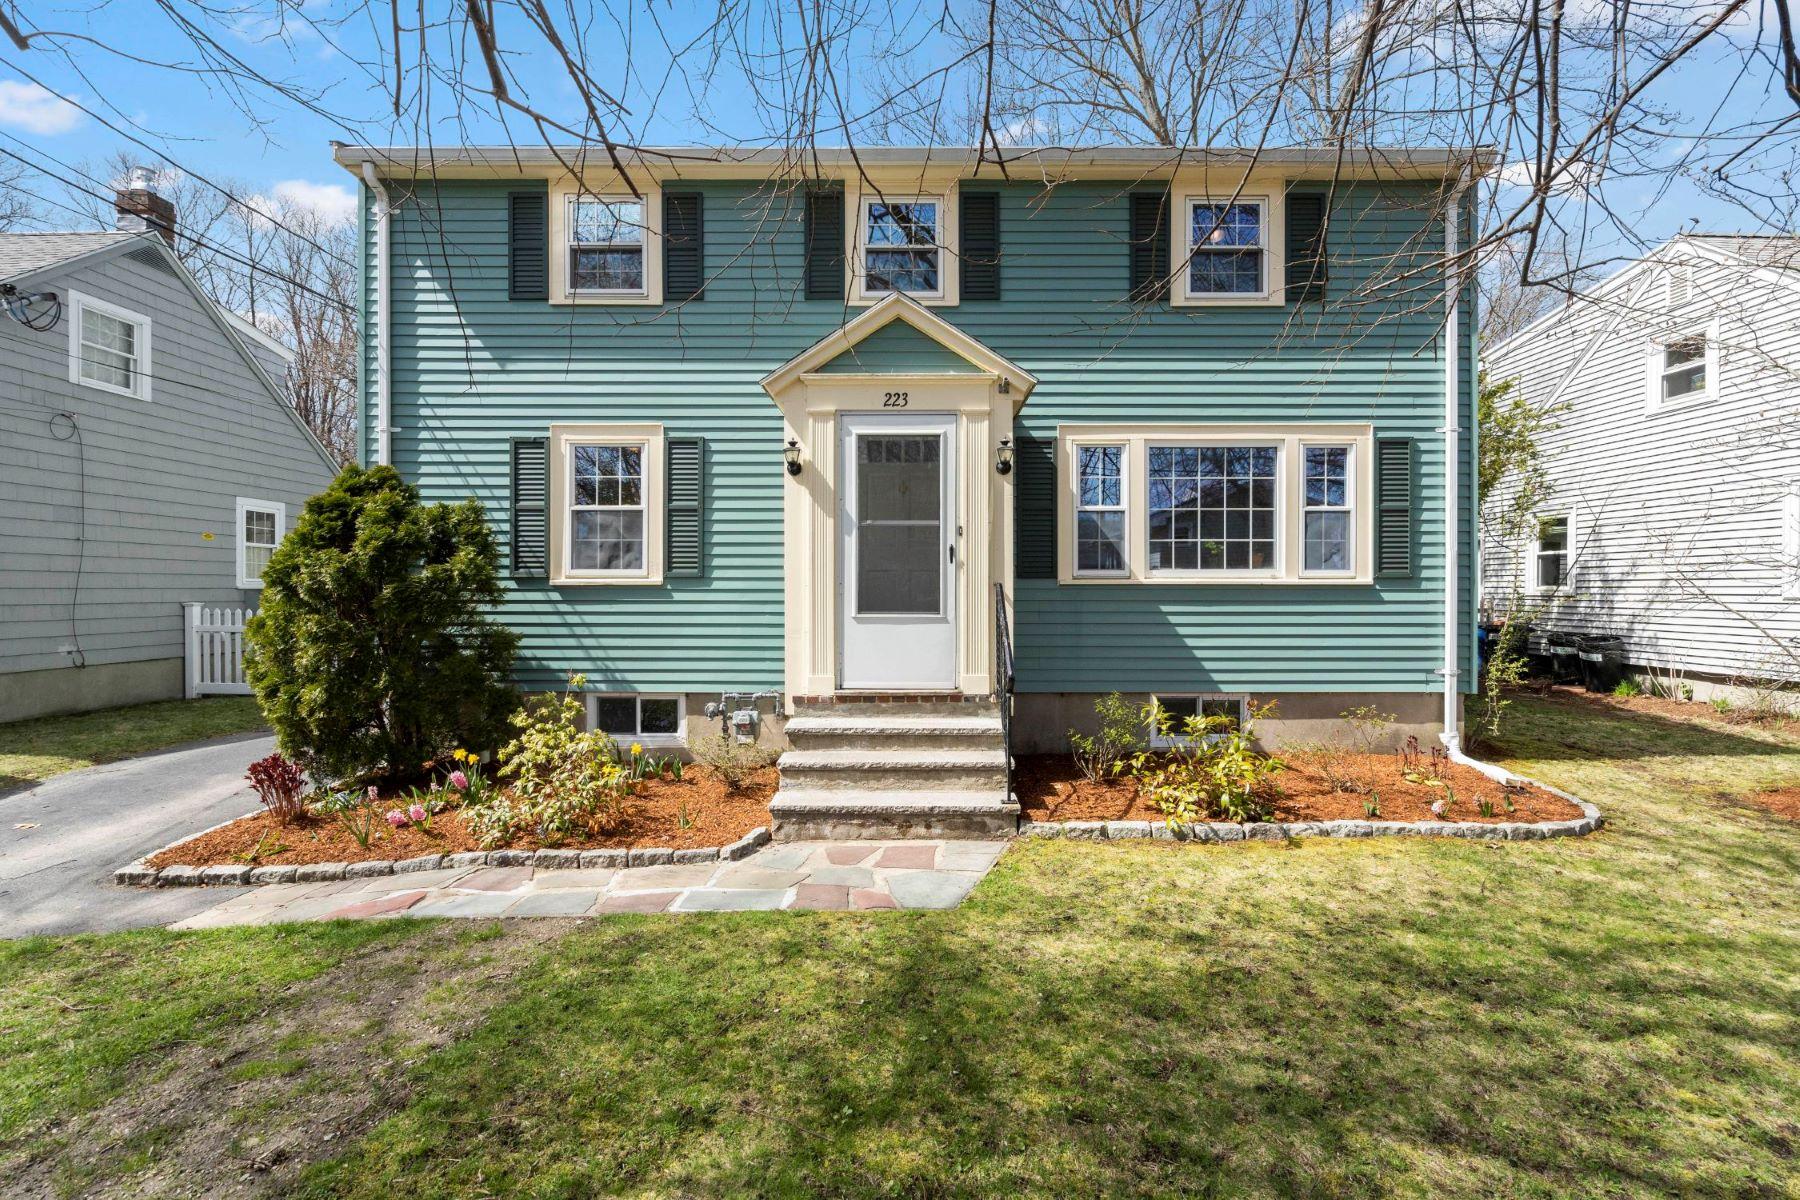 Single Family Homes για την Πώληση στο 223 Sylvia Street Arlington, Μασαχουσετη 02476 Ηνωμένες Πολιτείες